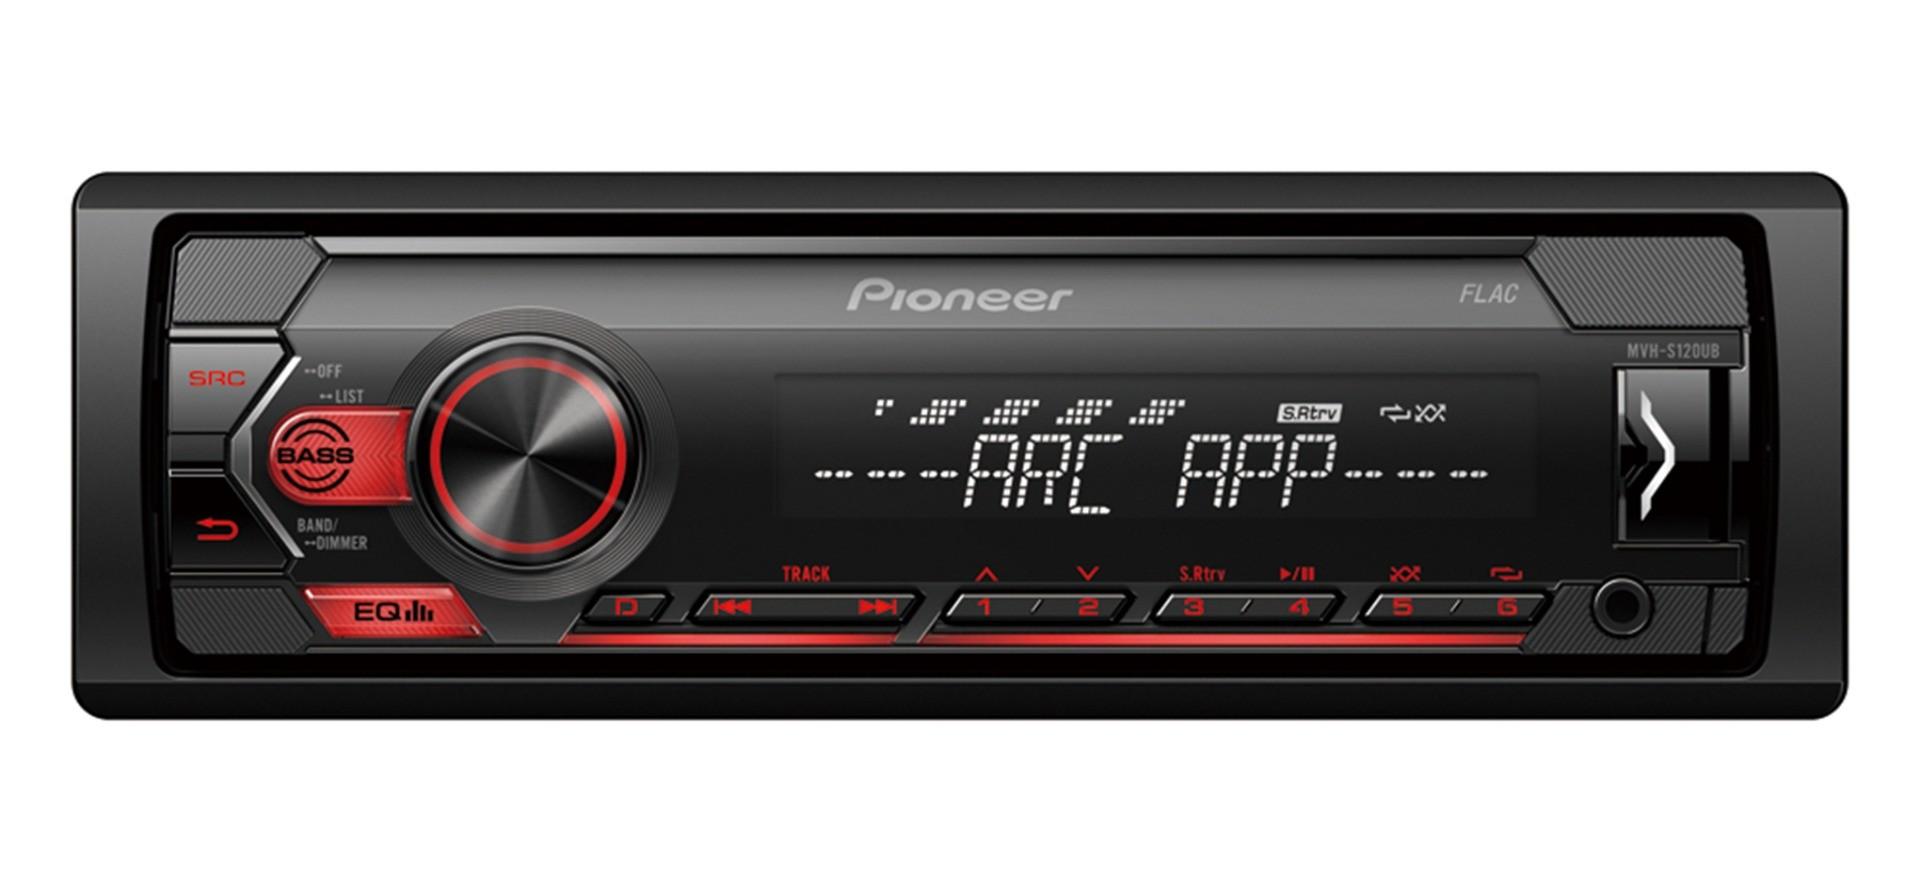 Pioneer MVH-S120UB  Receiver 1DIN USB